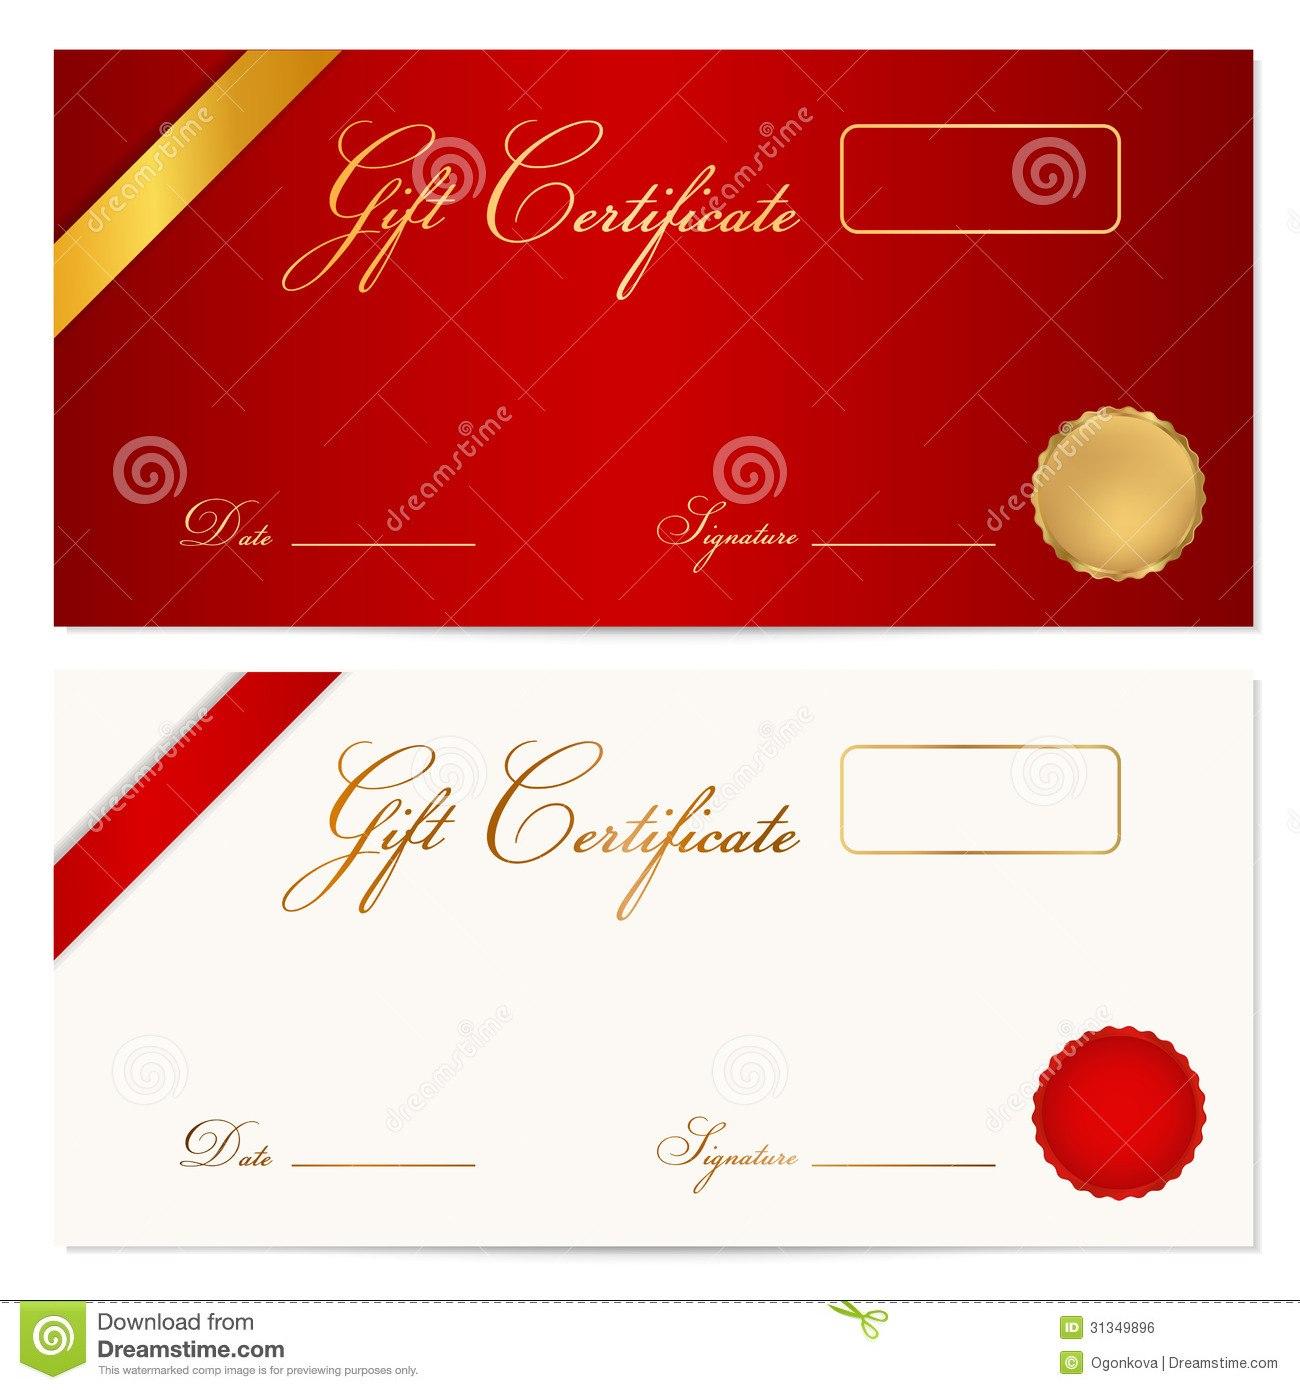 Gift Certificate Voucher Template Wax Seal Stock Vector With Graduation Gift Certificate Template Free